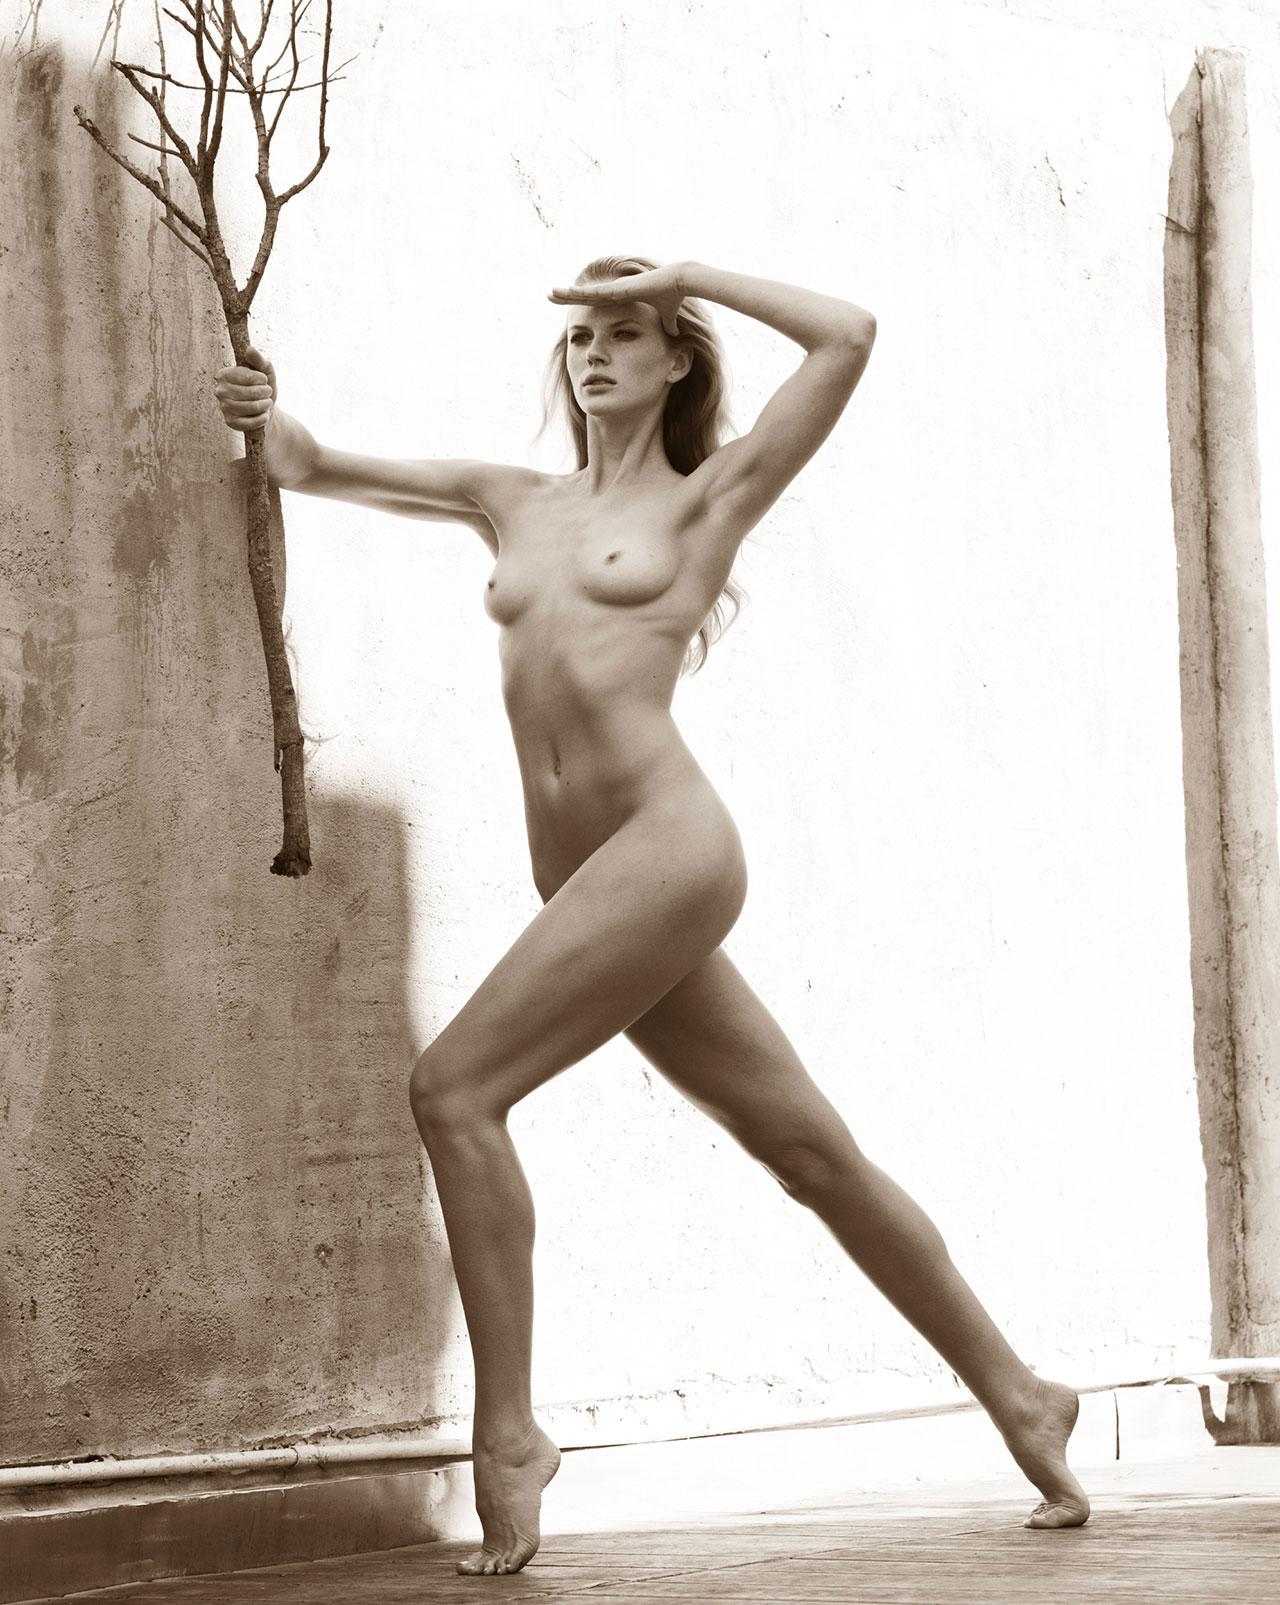 Tiger woods stripper girlfriend